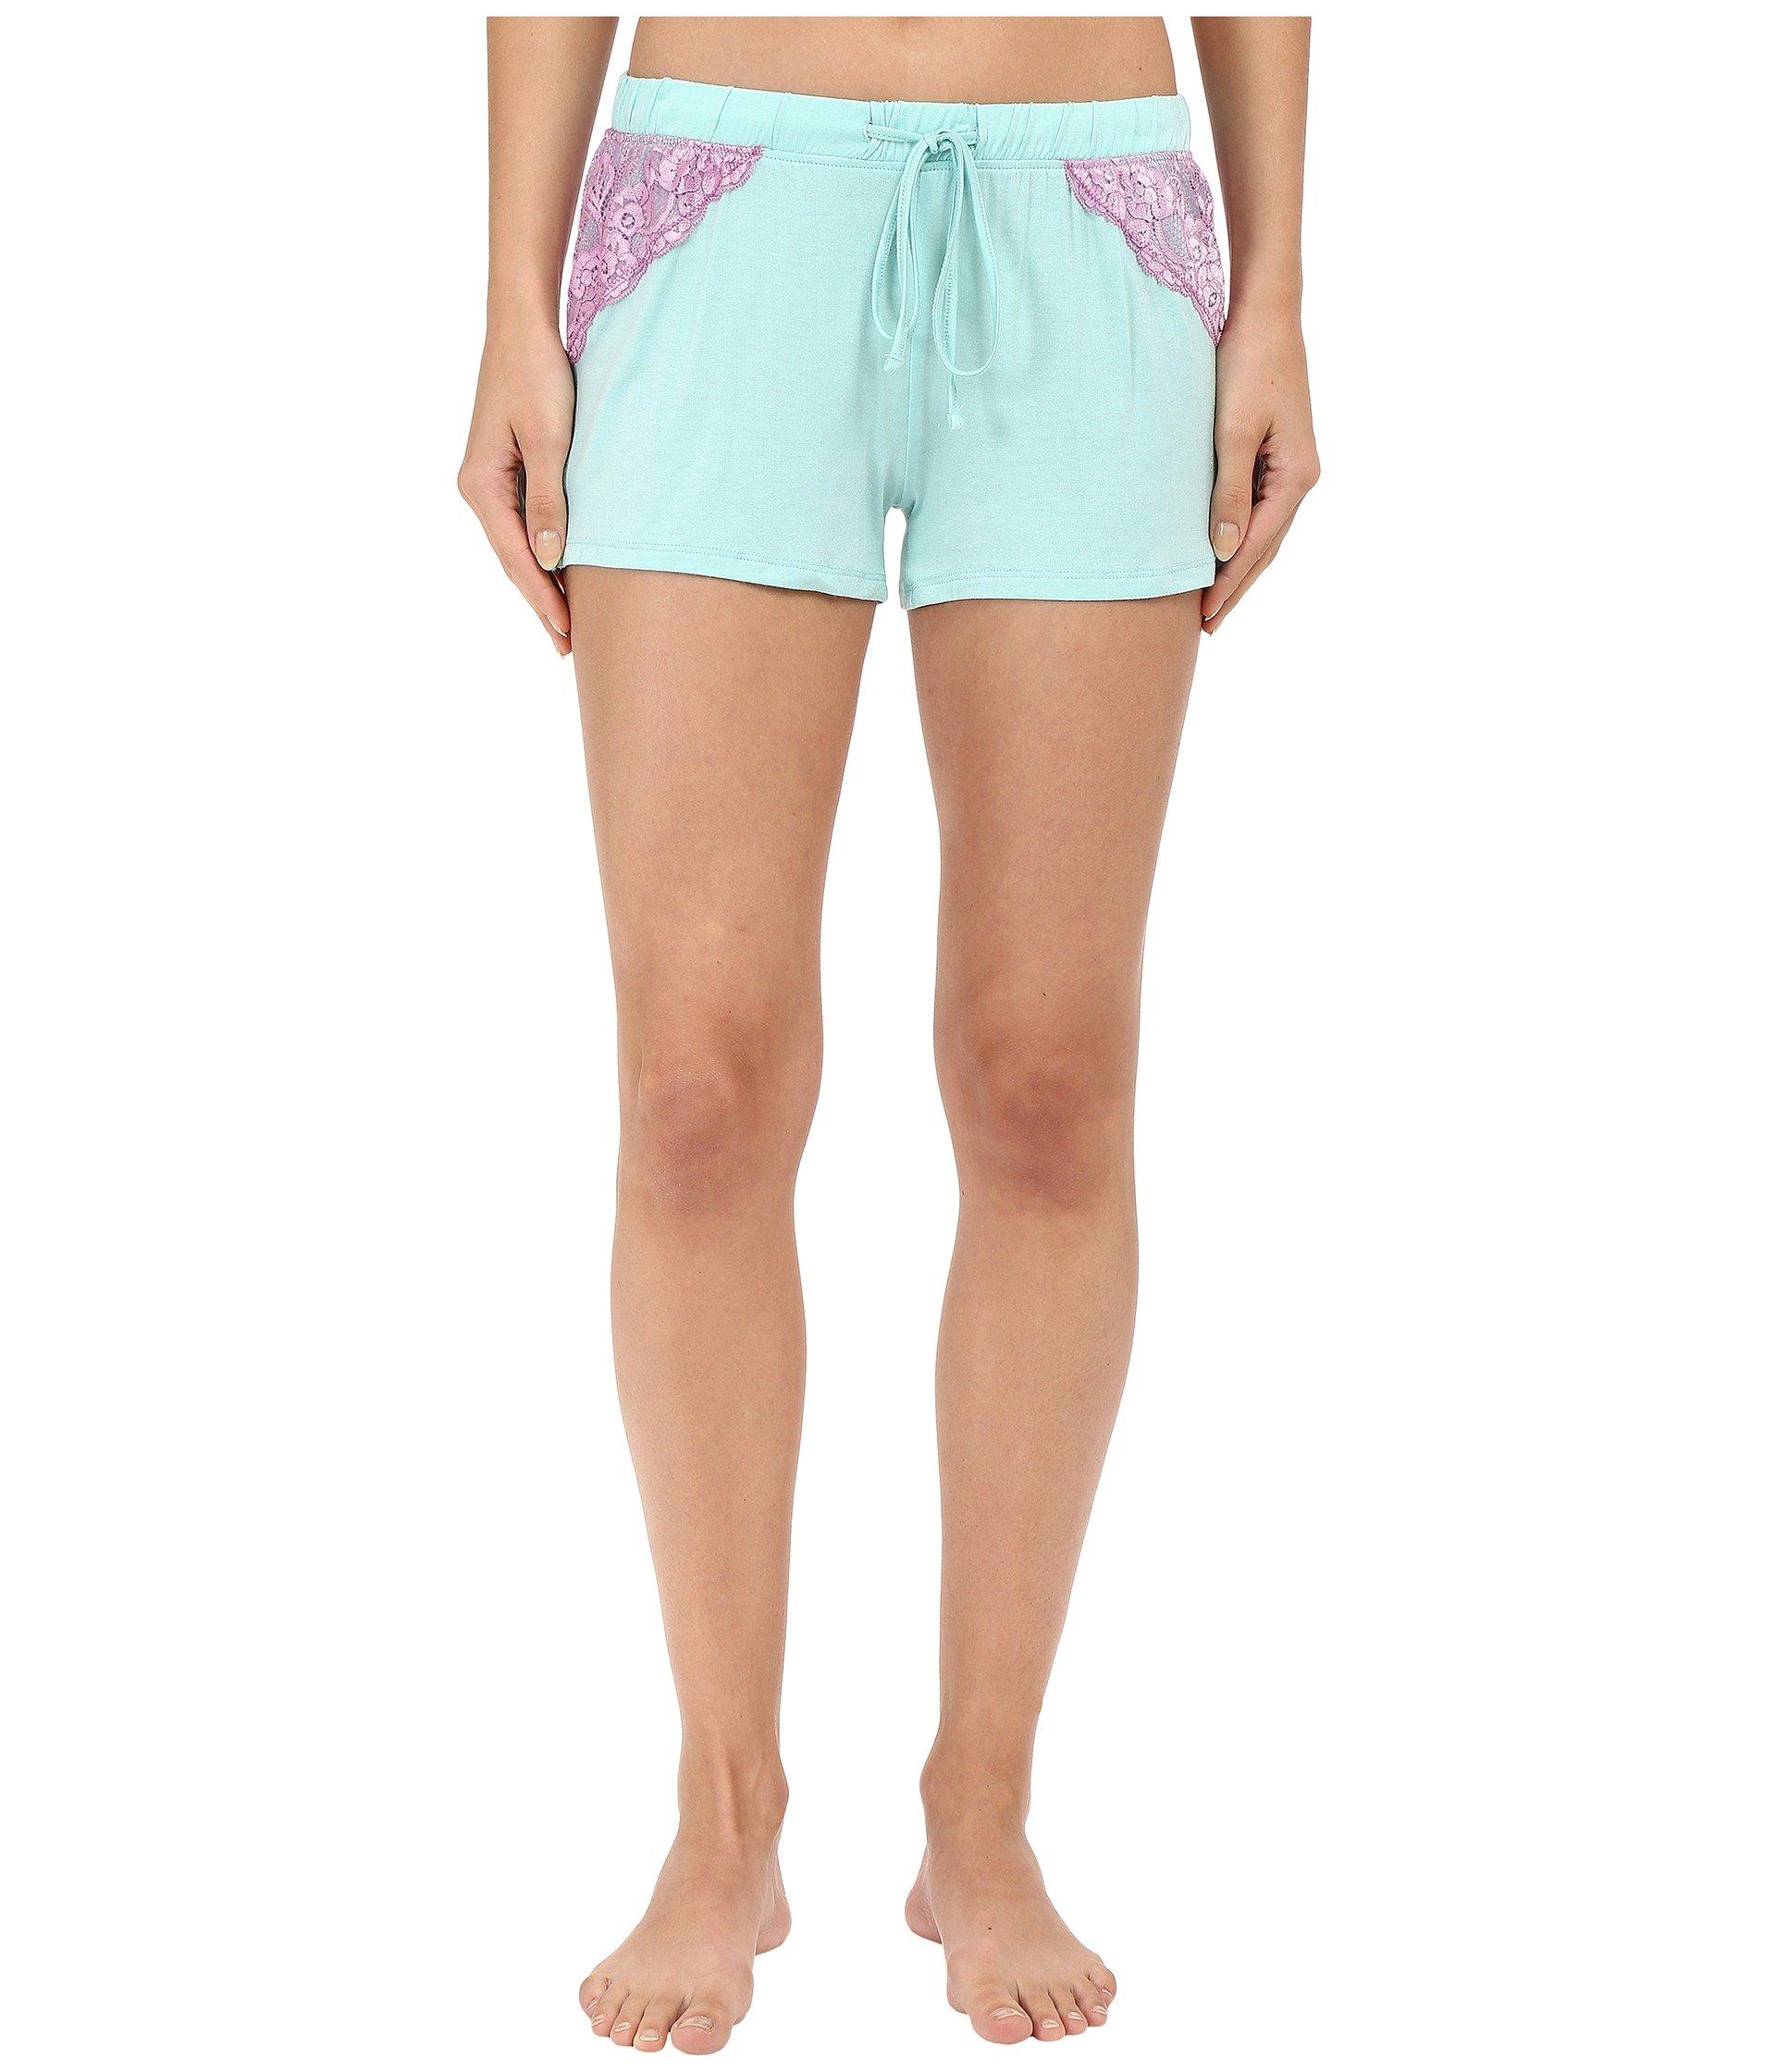 Pantalón de Pijama para Mujer P.J. Salvage Sorbet Combo Shorts  + P.J. Salvage en VeoyCompro.net